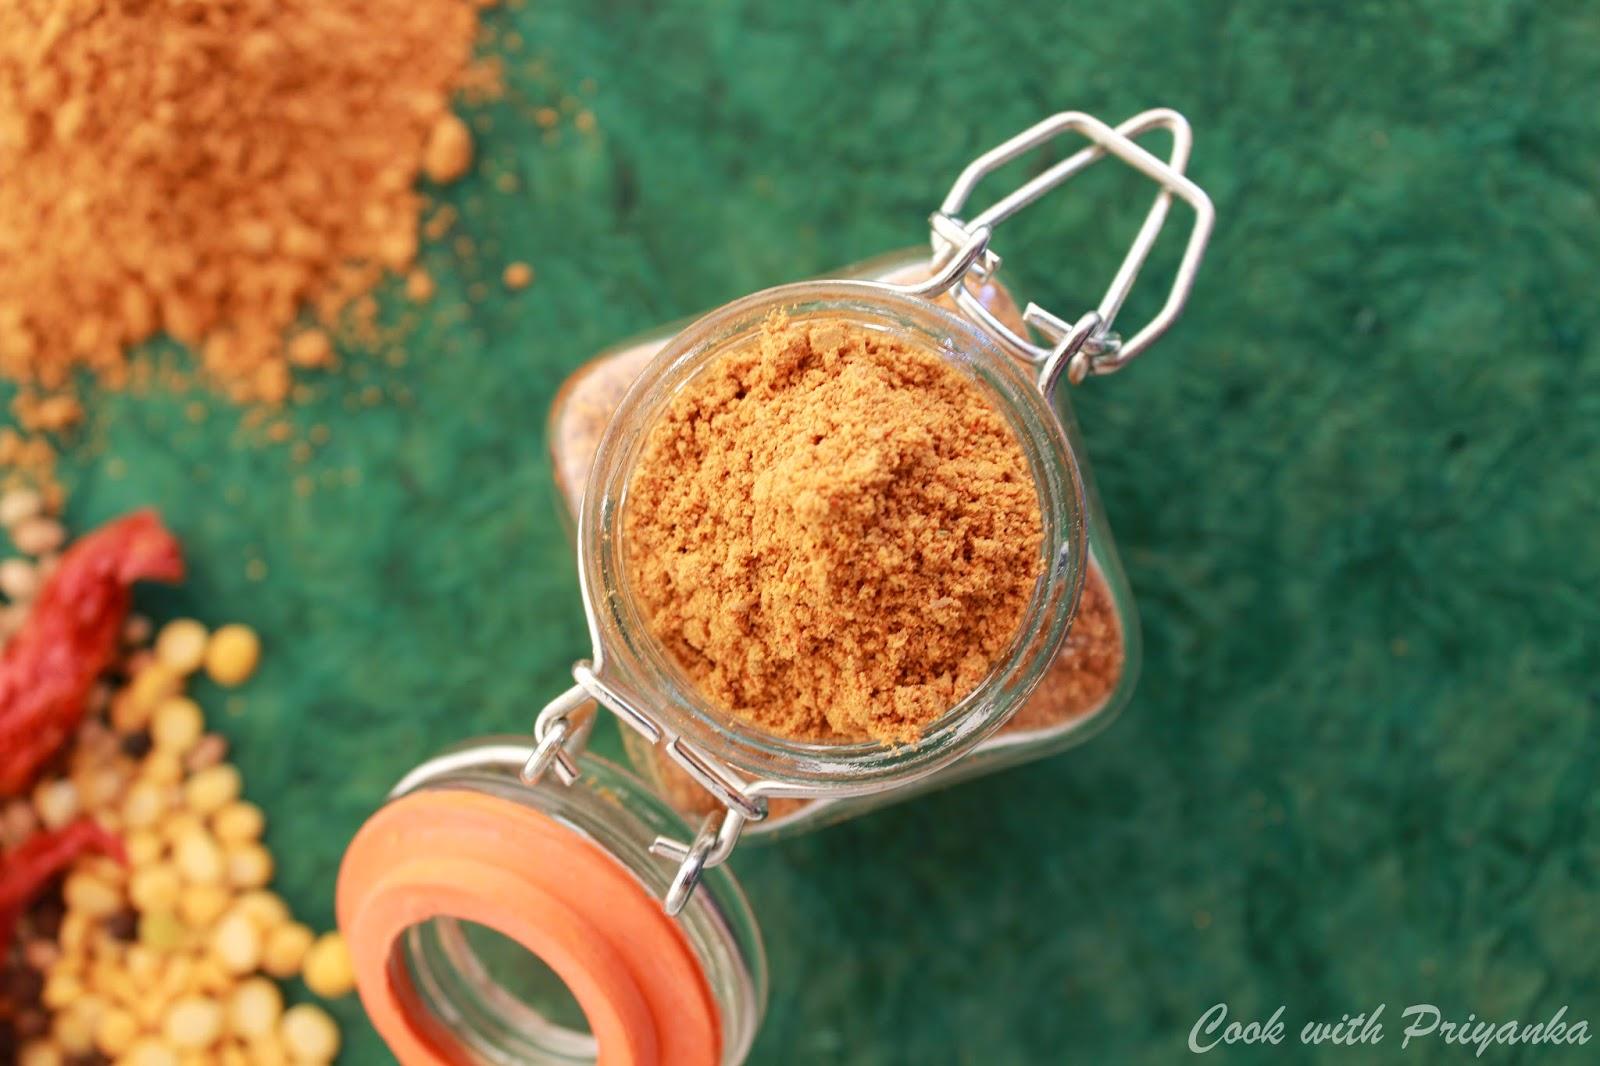 http://cookwithpriyankavarma.blogspot.co.uk/2014/06/homemade-sambhar-powdersambhar-podi.html